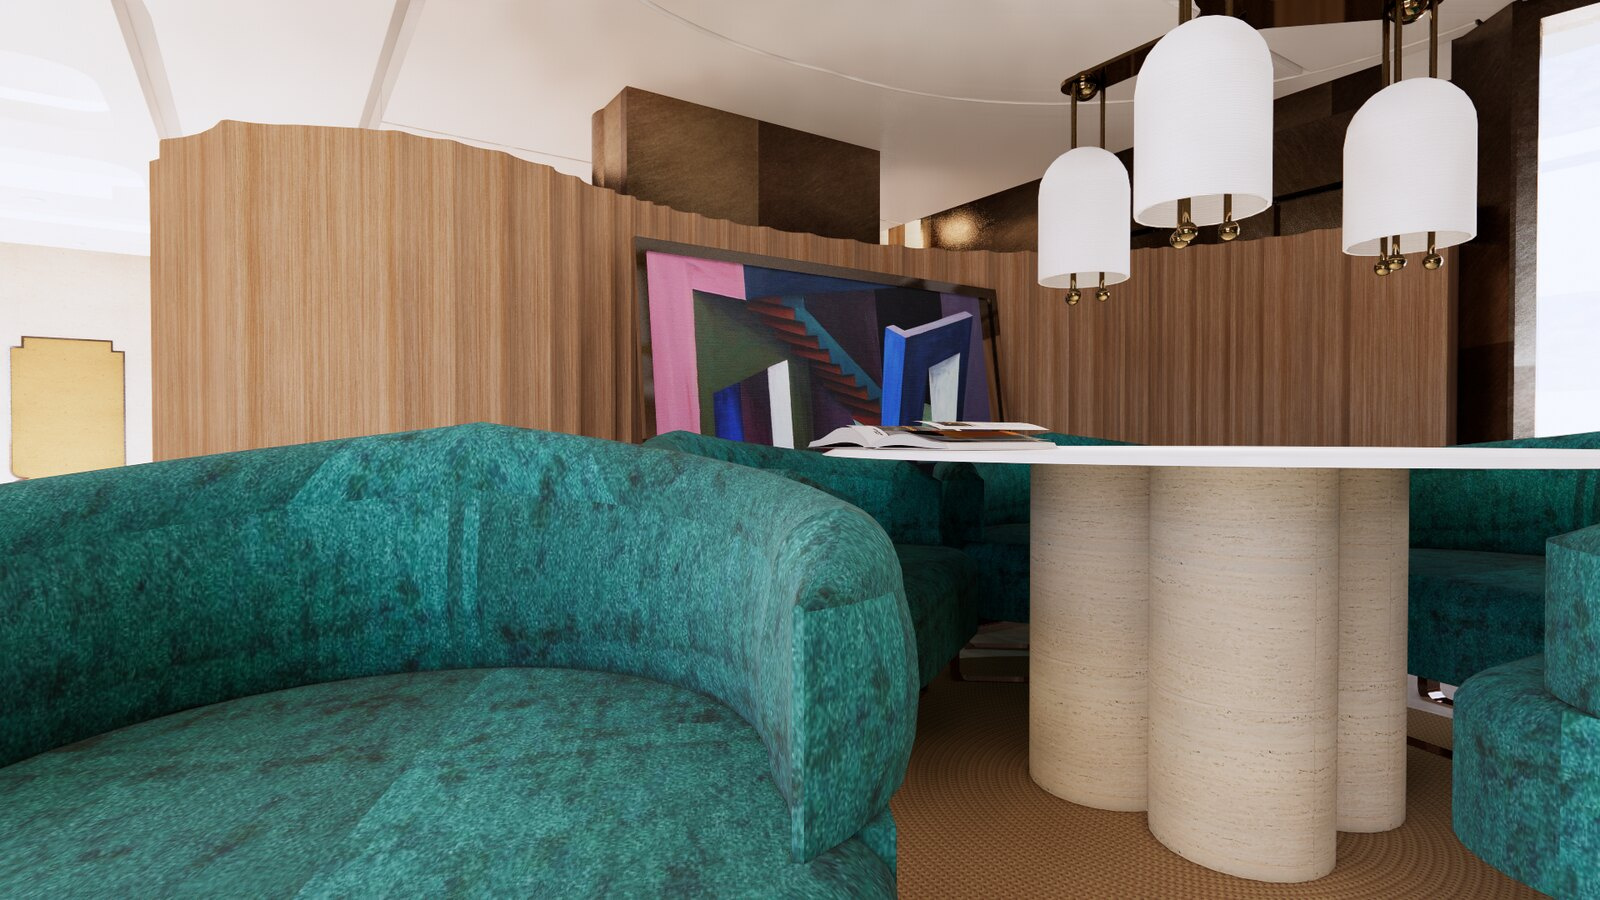 Brianna Mckenzie IAR yacht studio design